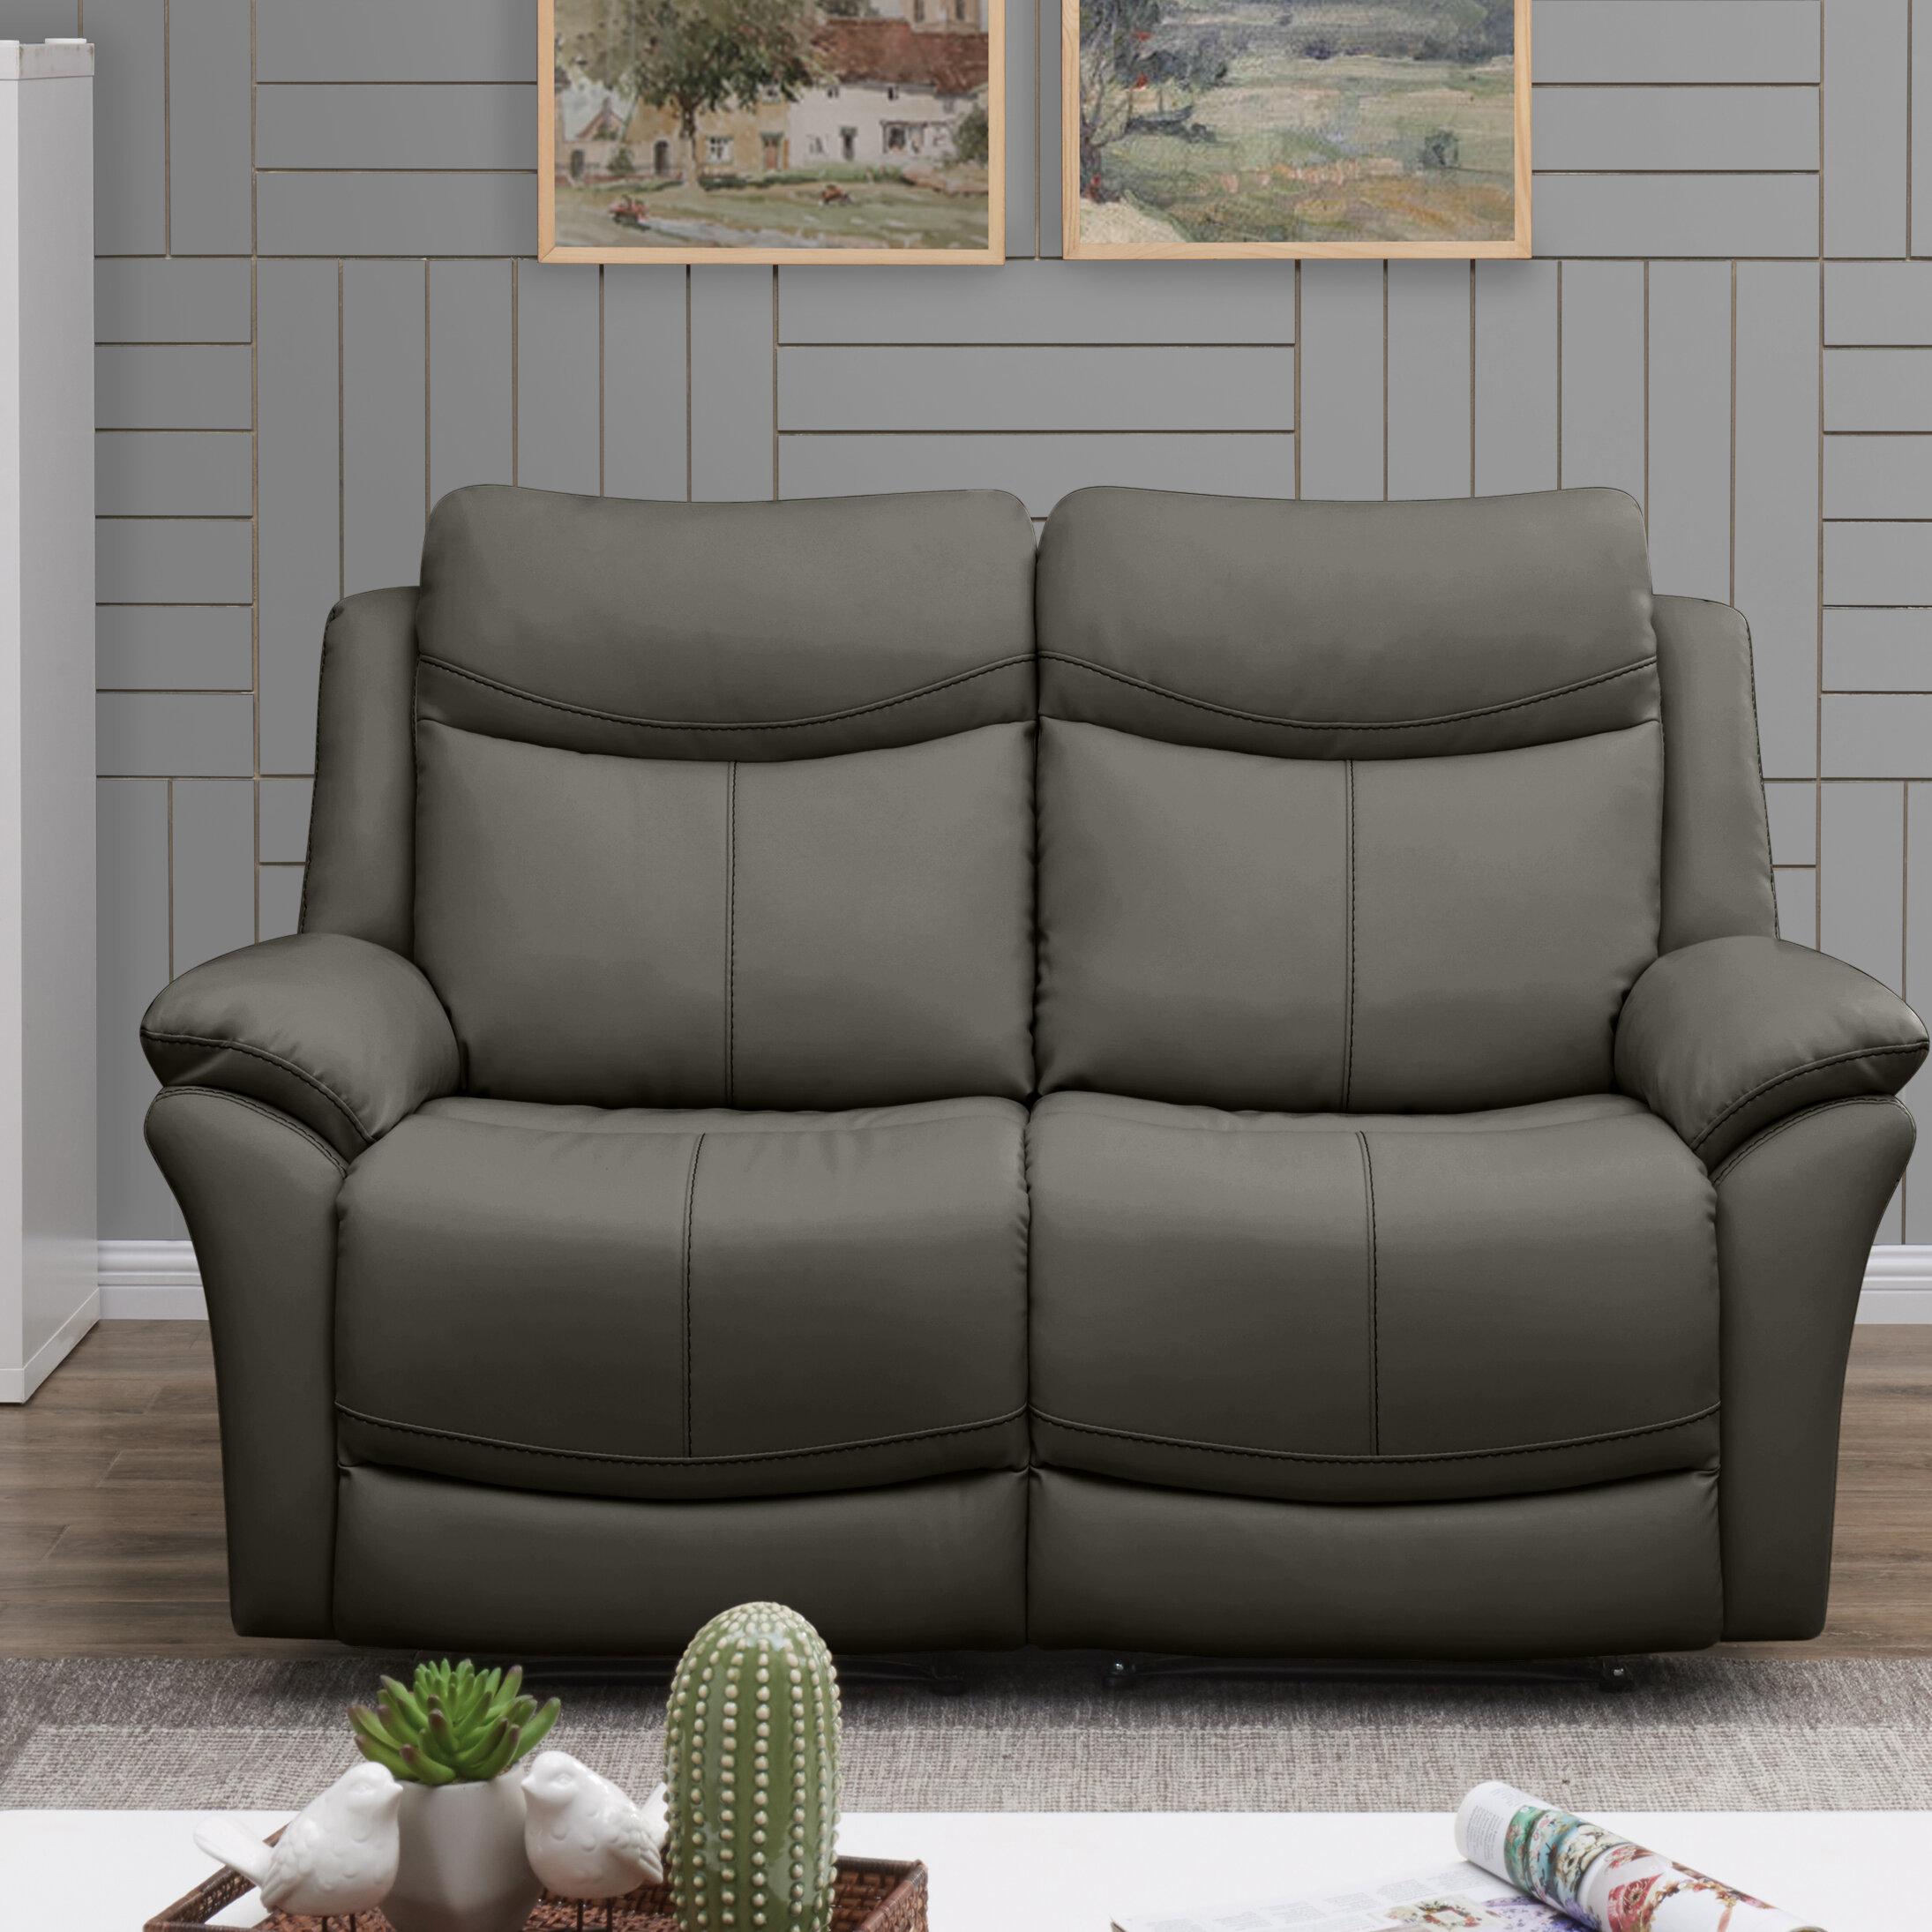 Swell Jabari 2 Seat Wall Hugger Reclining Home Theater Loveseat Short Links Chair Design For Home Short Linksinfo